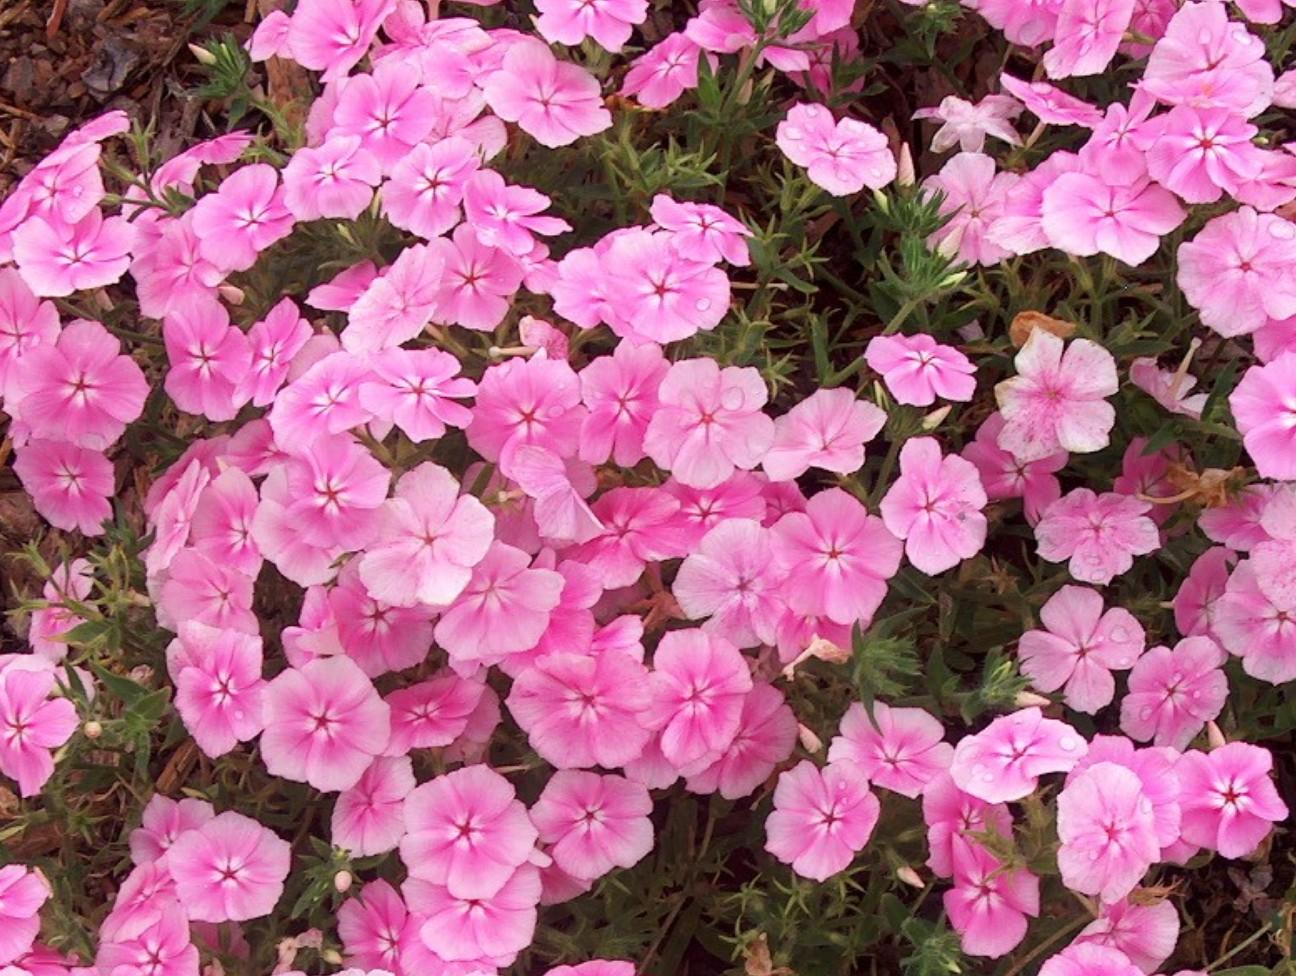 Phlox 'Intensia Pink'  / Phlox 'Intensia Pink'